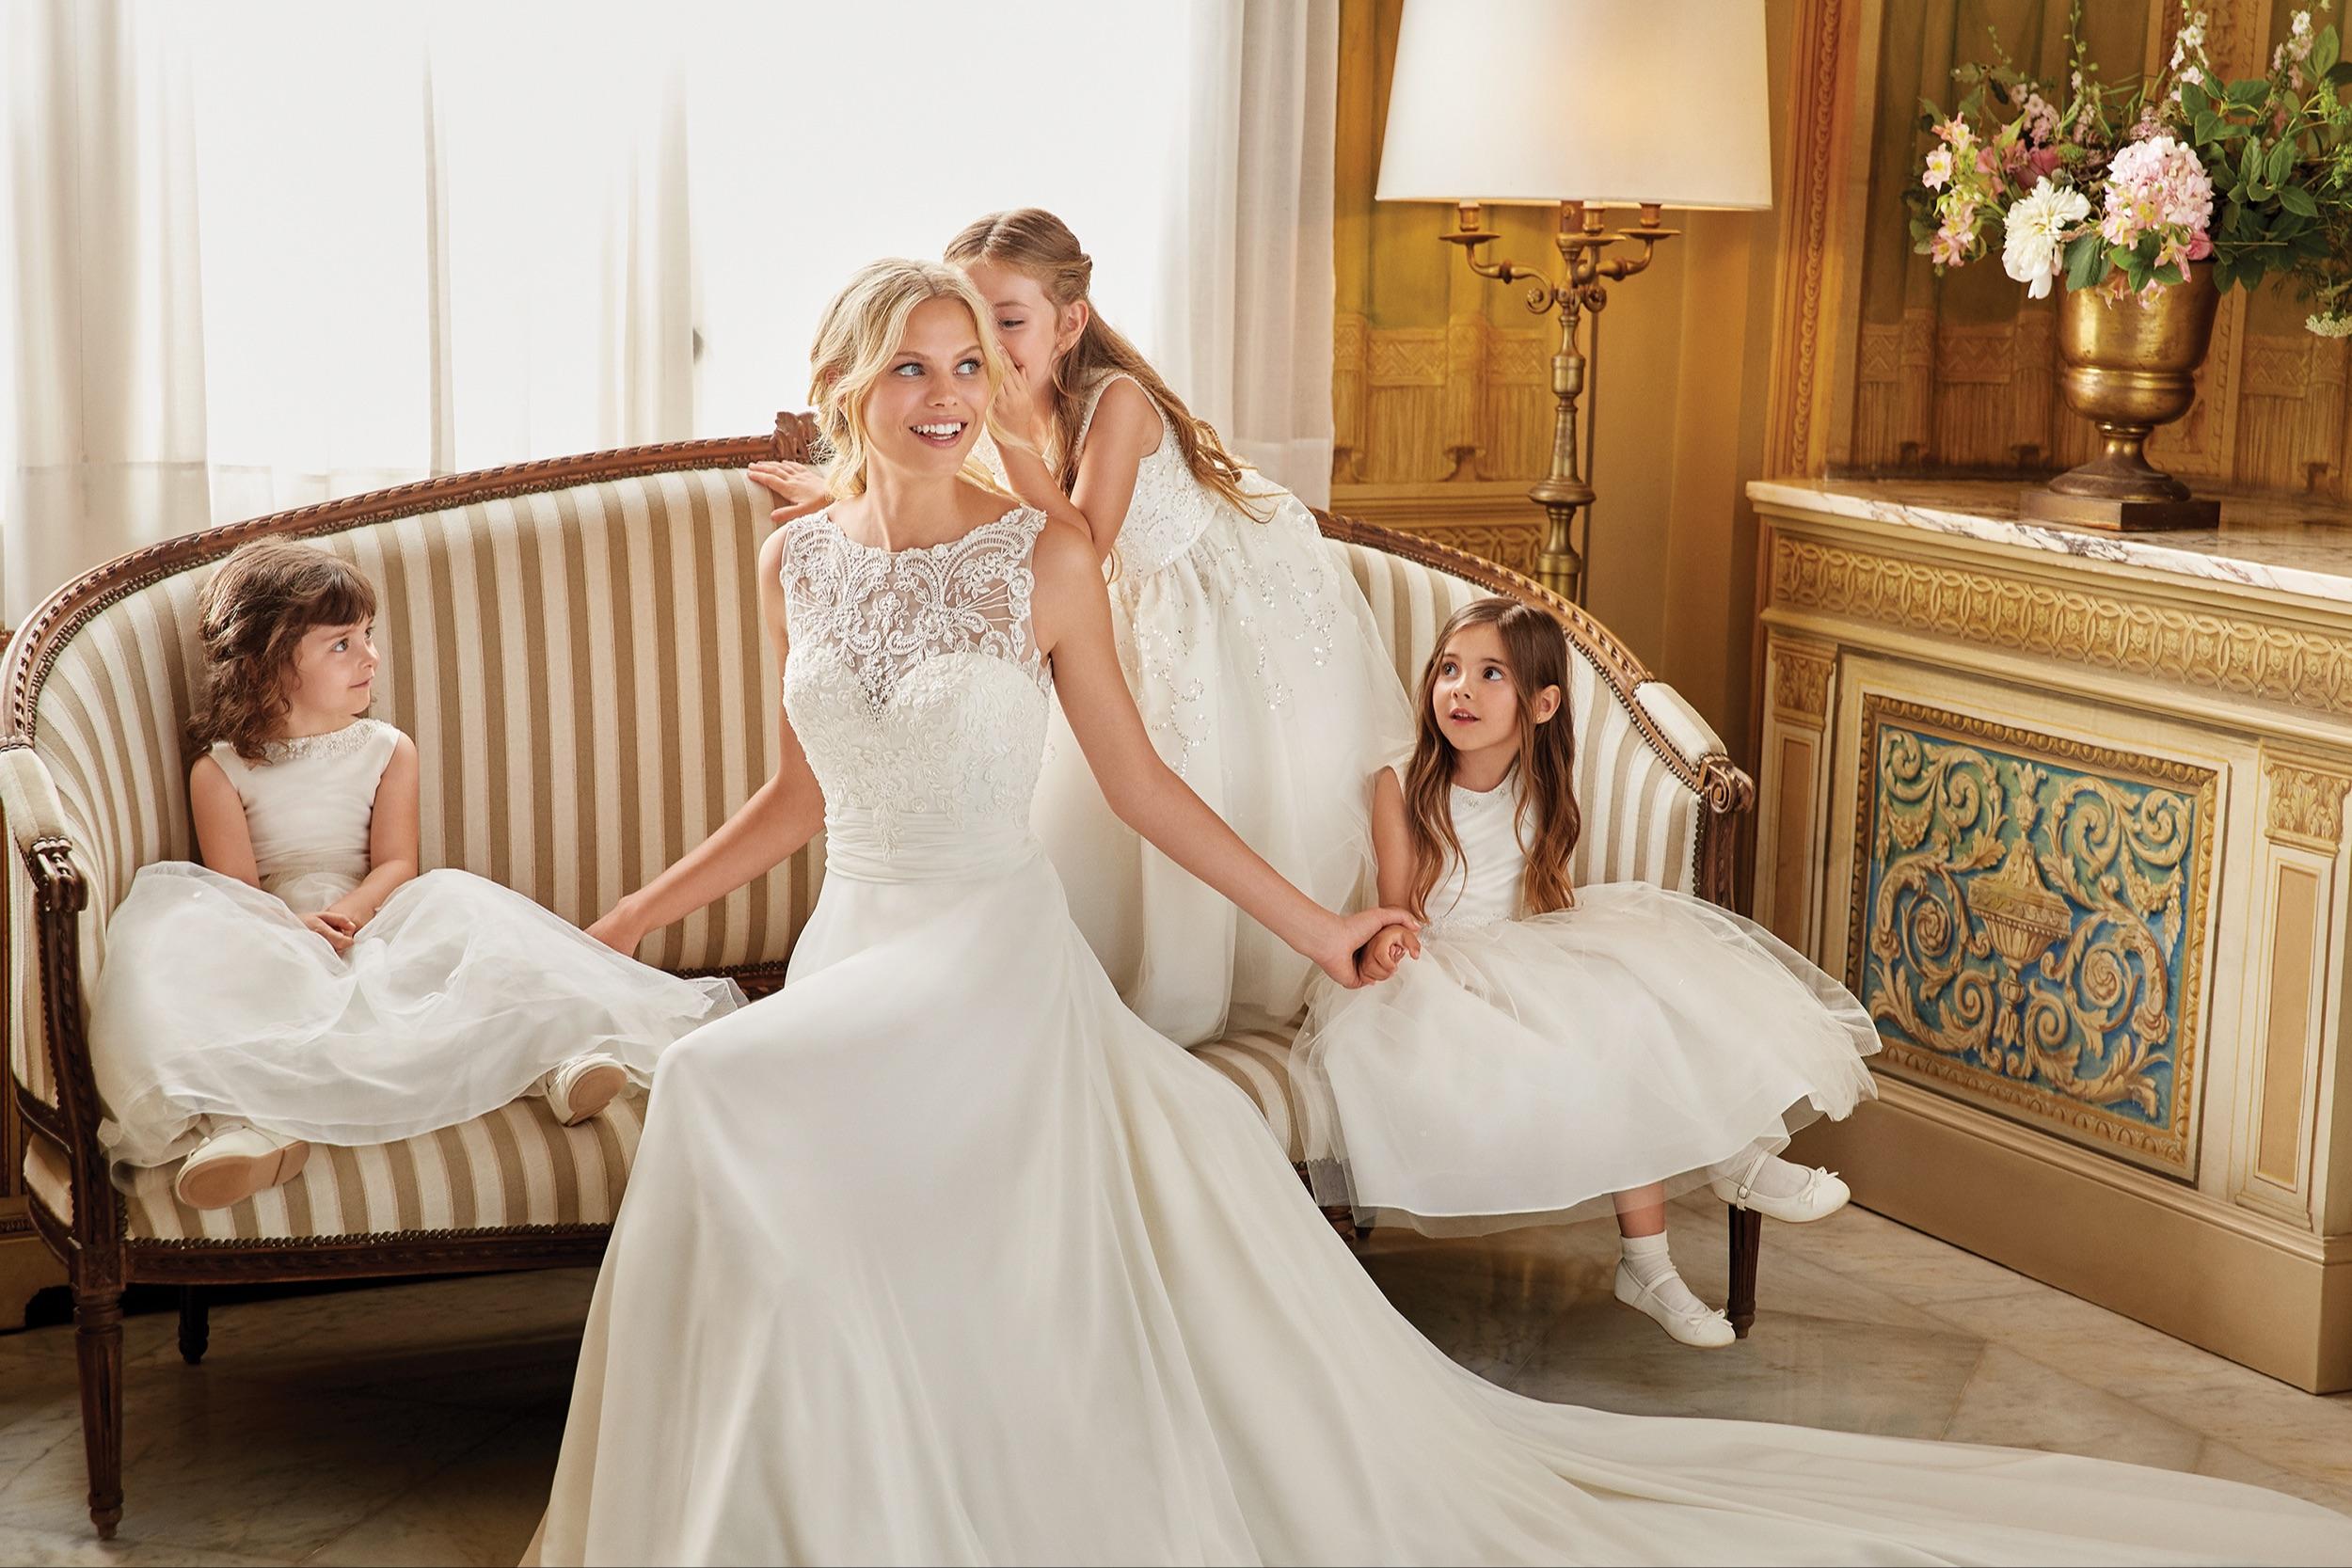 Simple Wedding Dresses Under 500: Trouwjurken, Herenkostuums, Feestkledij Of Kinderoutfits